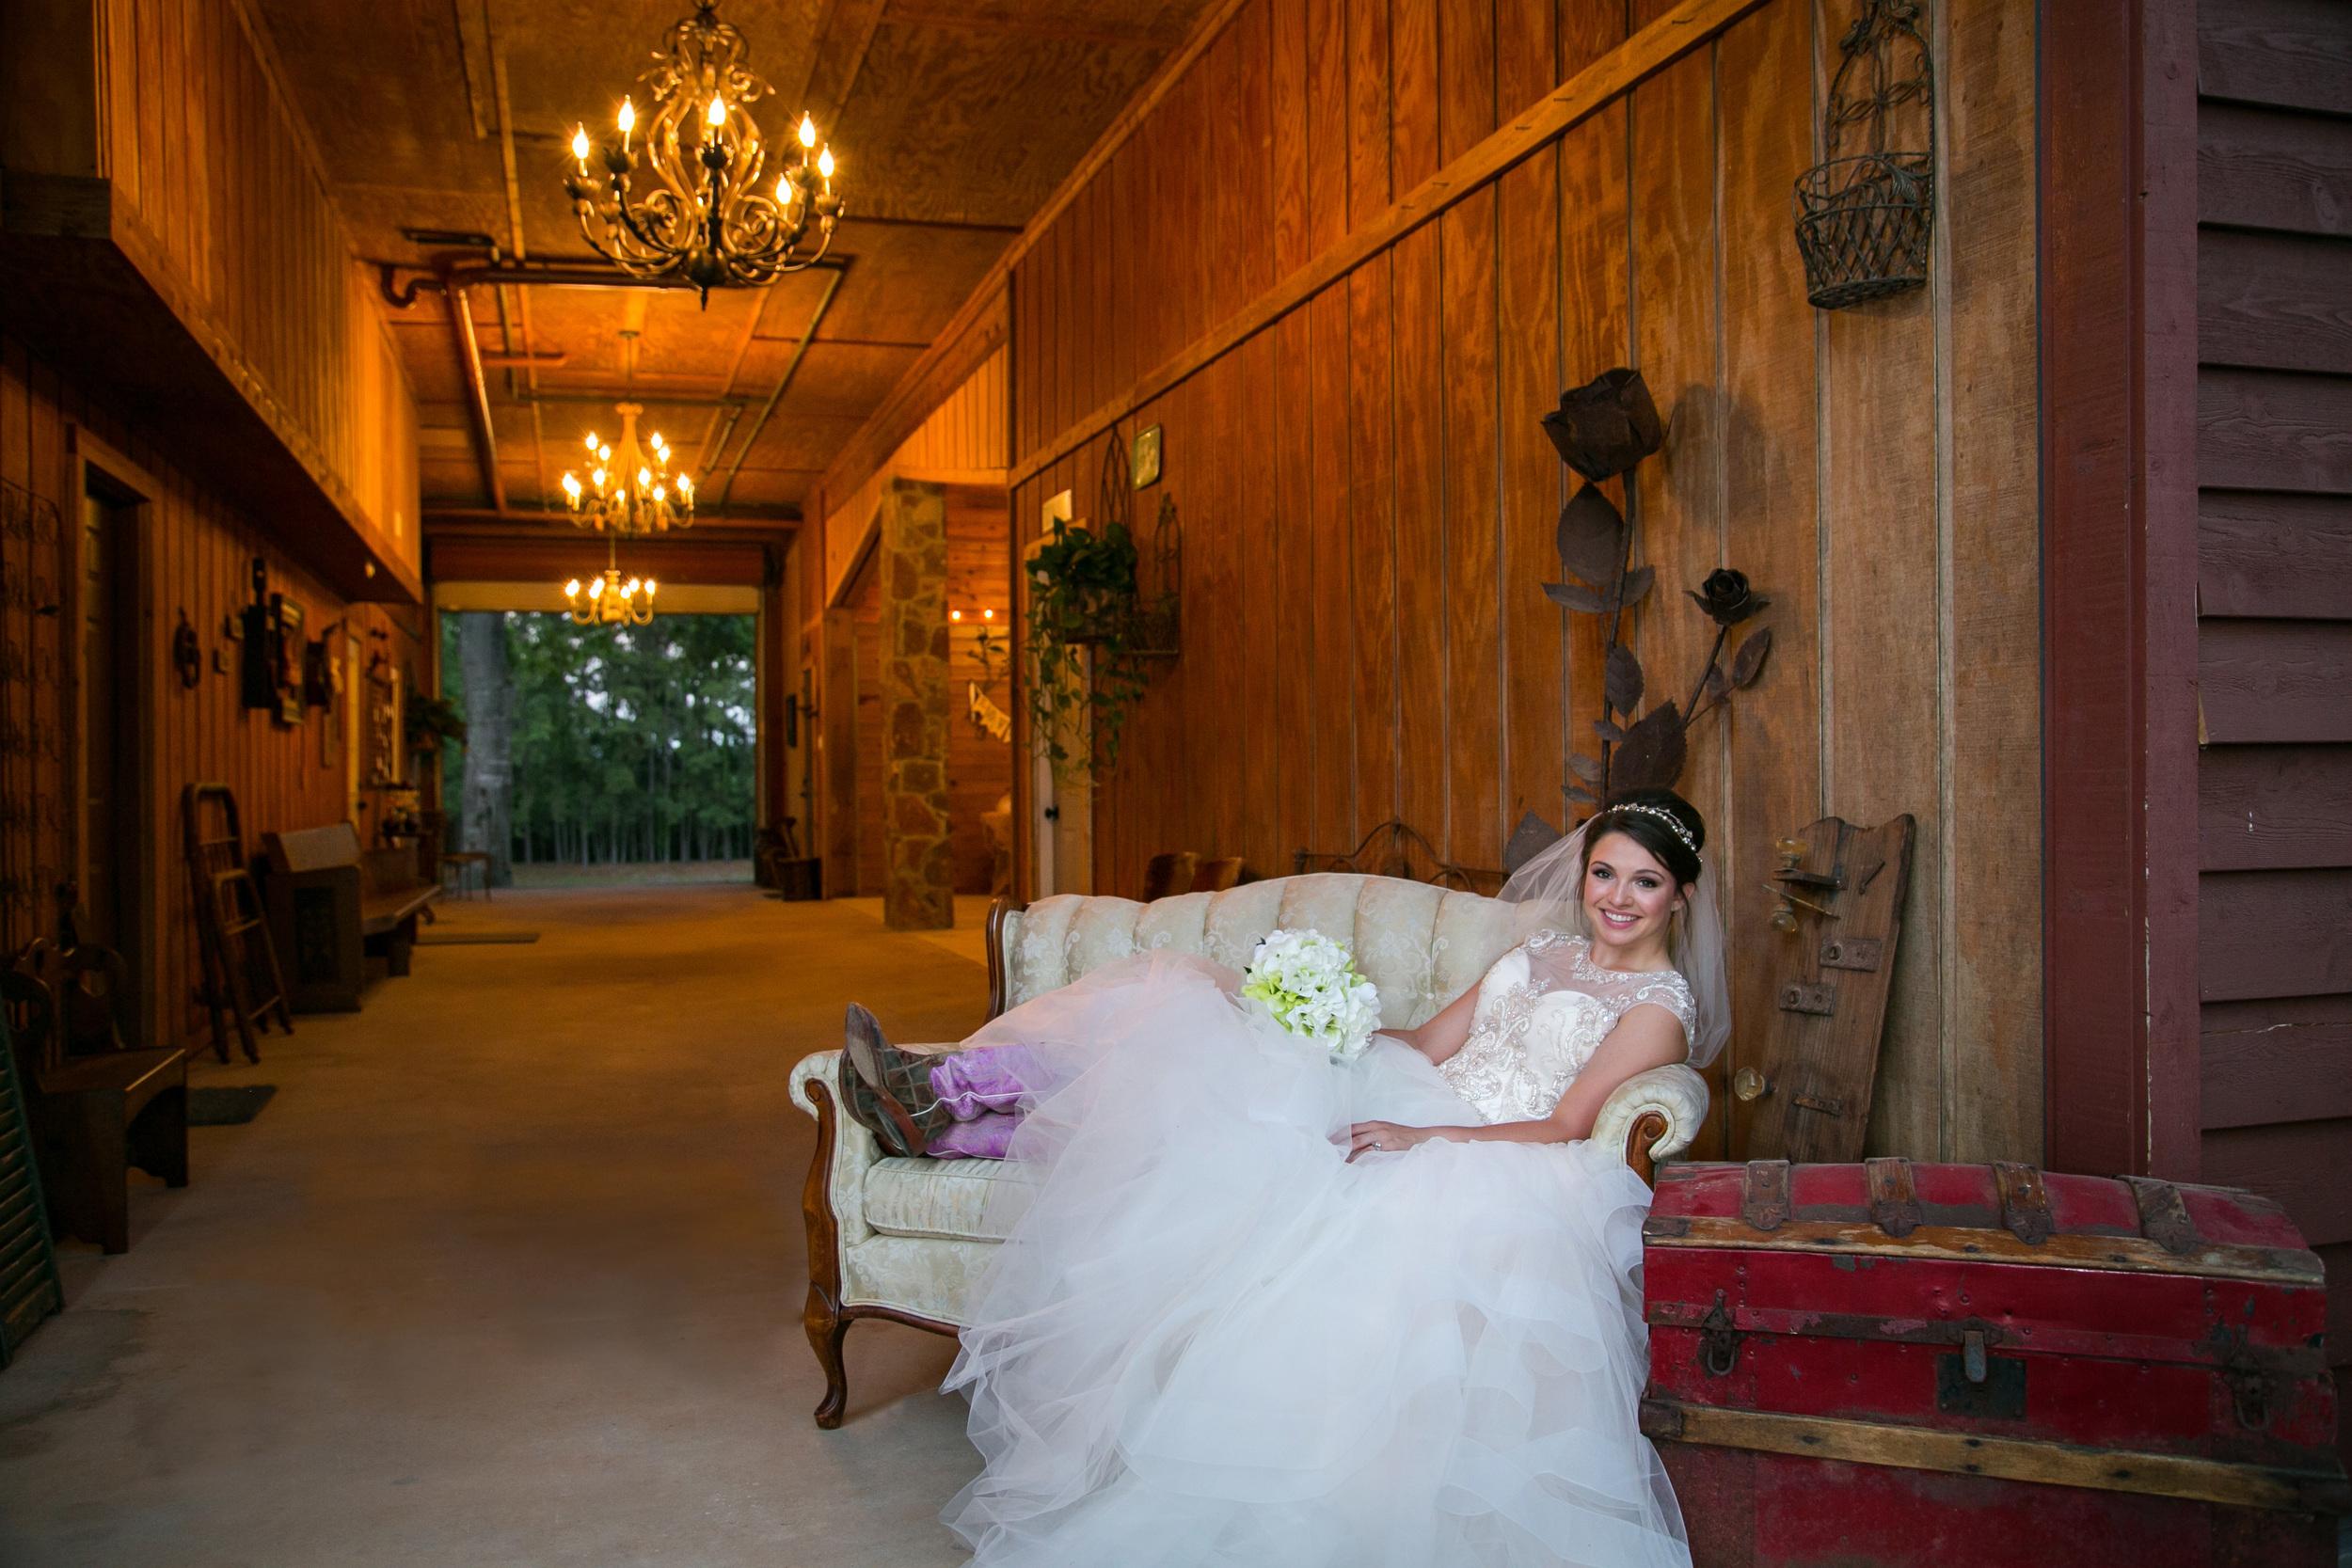 A model bride from a photo shoot takenin our beautiful breezeway.